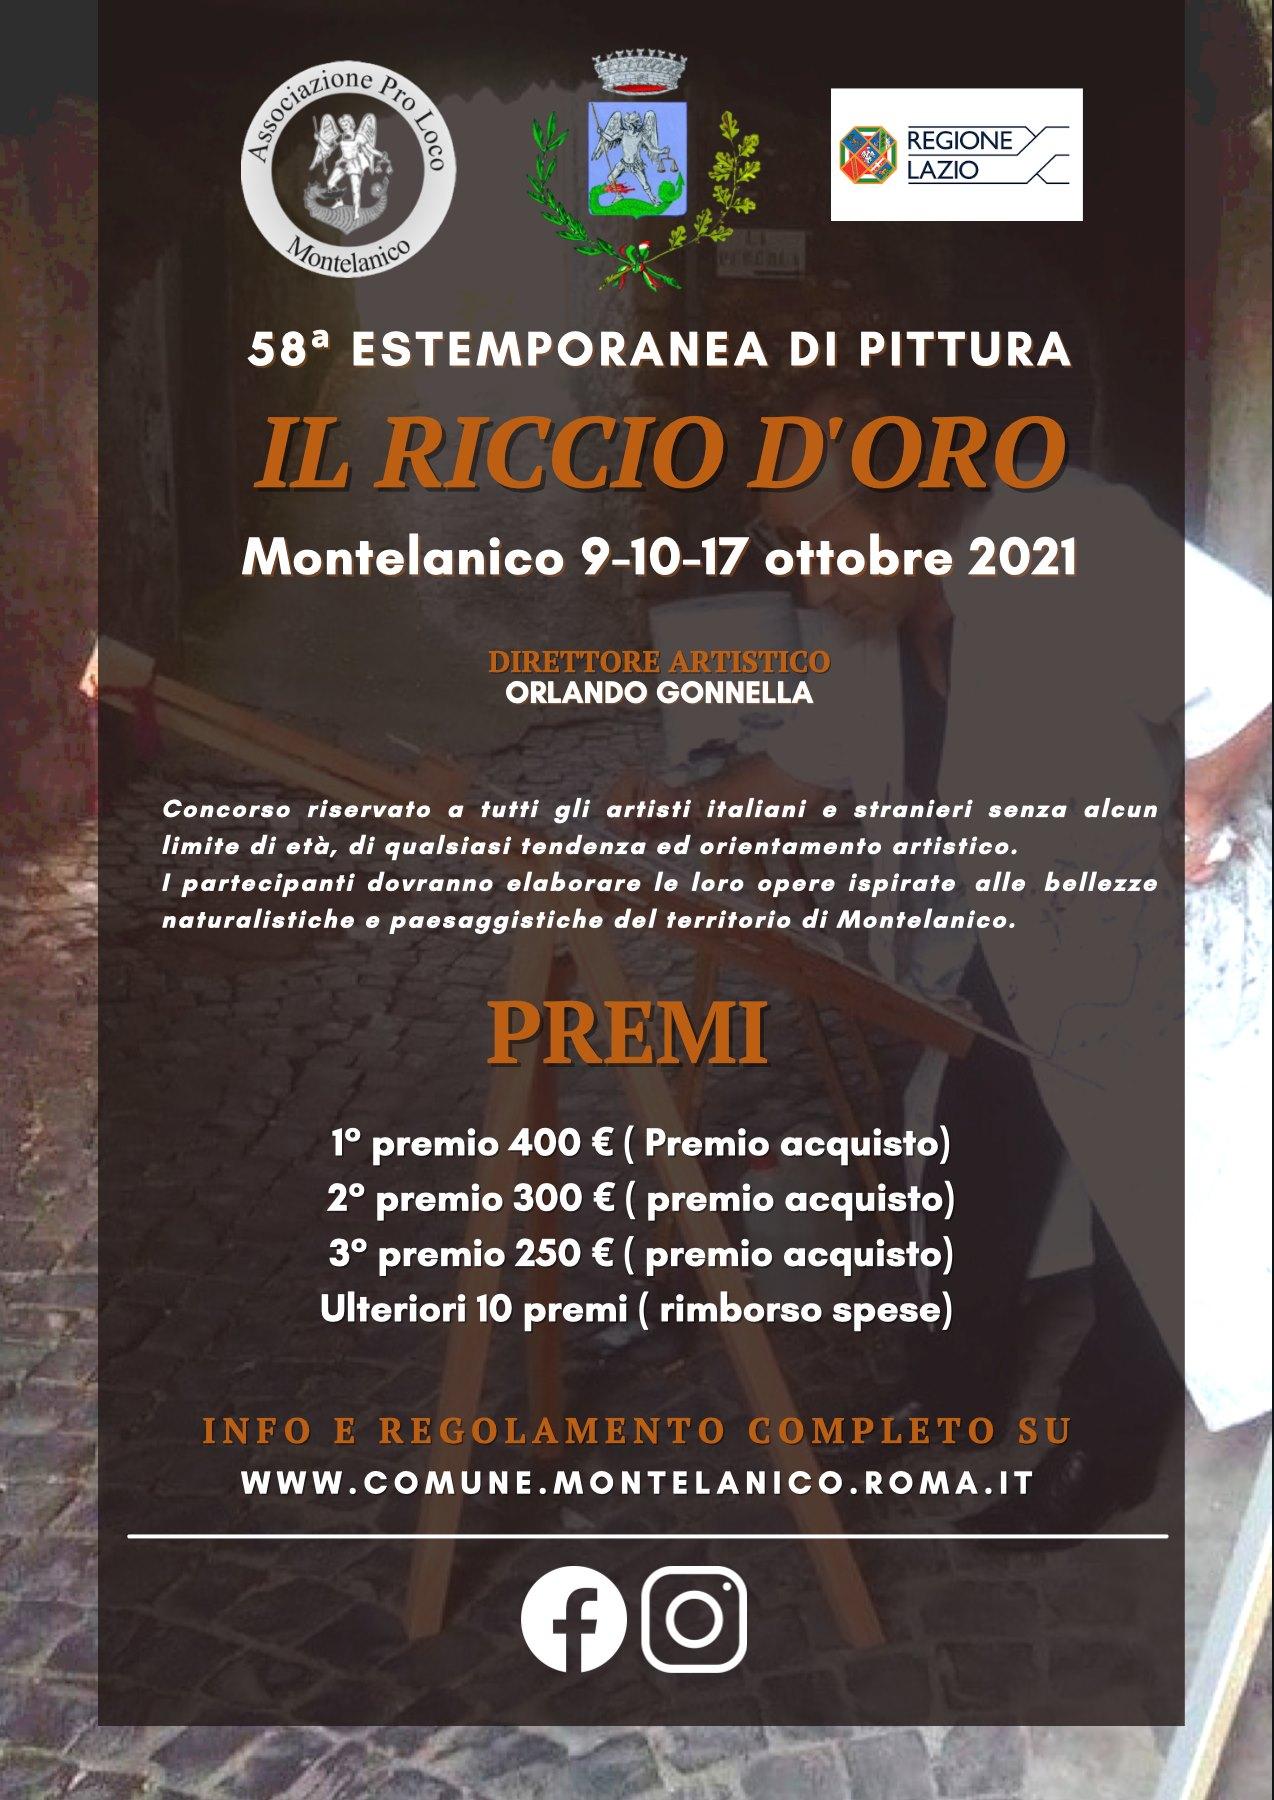 Montelanico: Il Riccio d'oro @ Montelanico